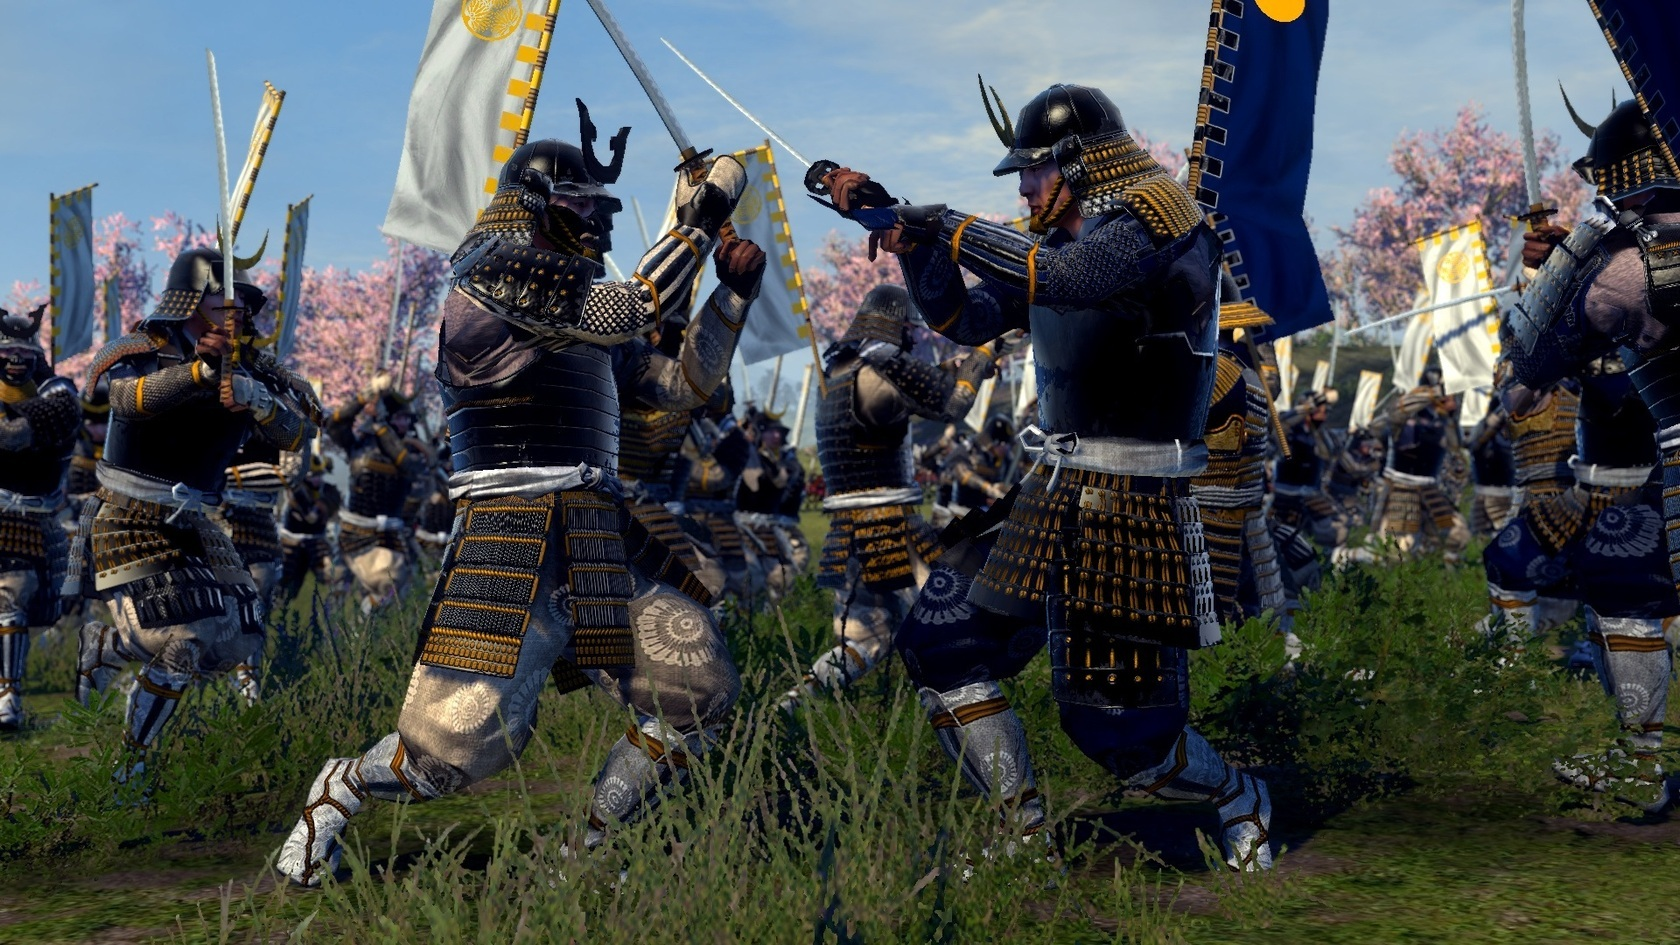 Total War Shogun 2 Wallpapers Video Game Hq Total War Shogun 2